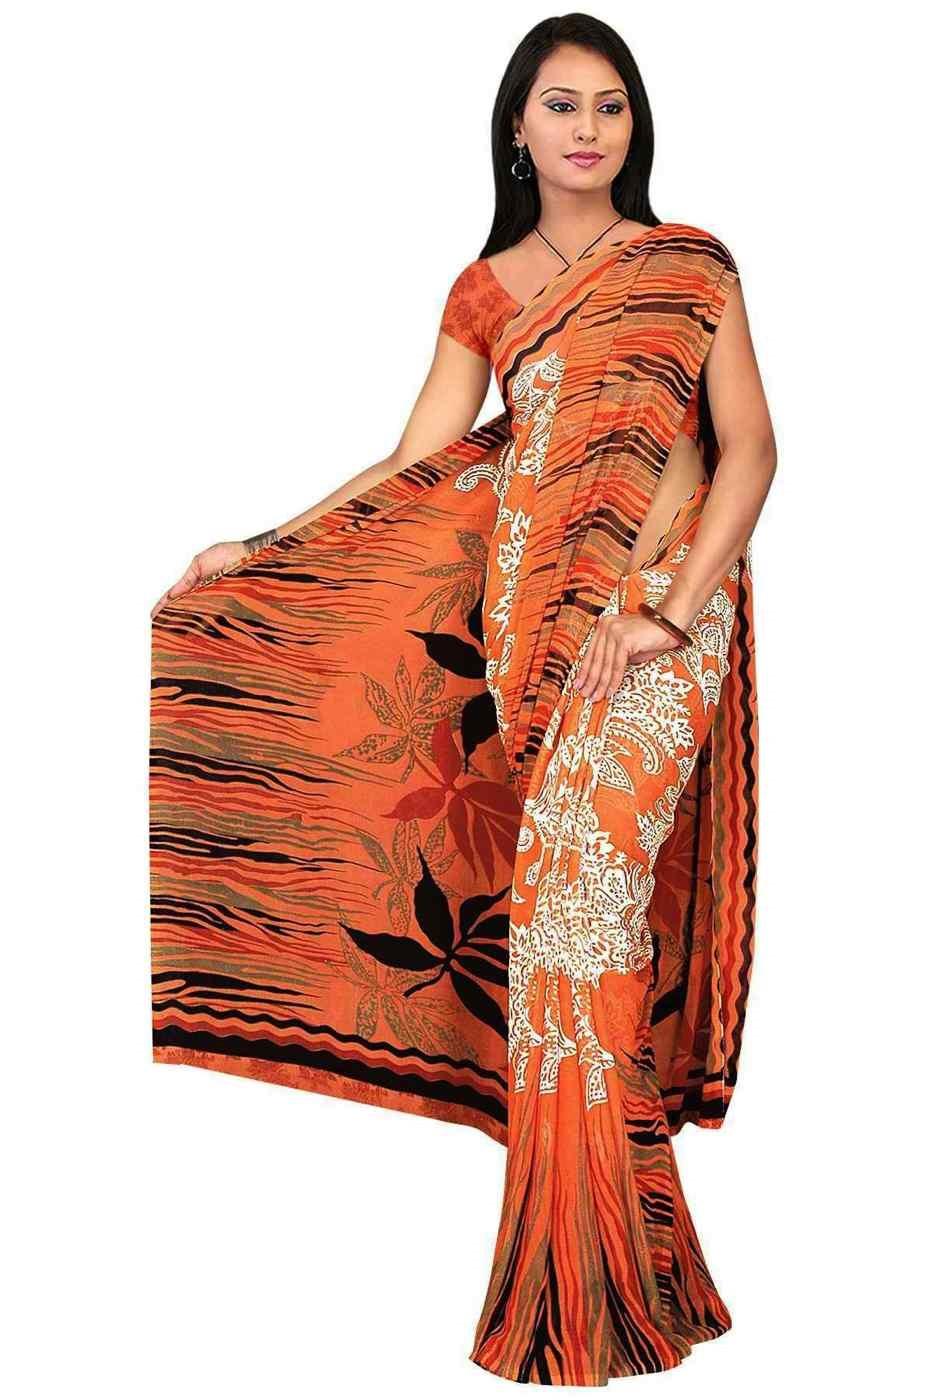 Drishya Georgette Printed Casual Saree Sari Bellydance fabric